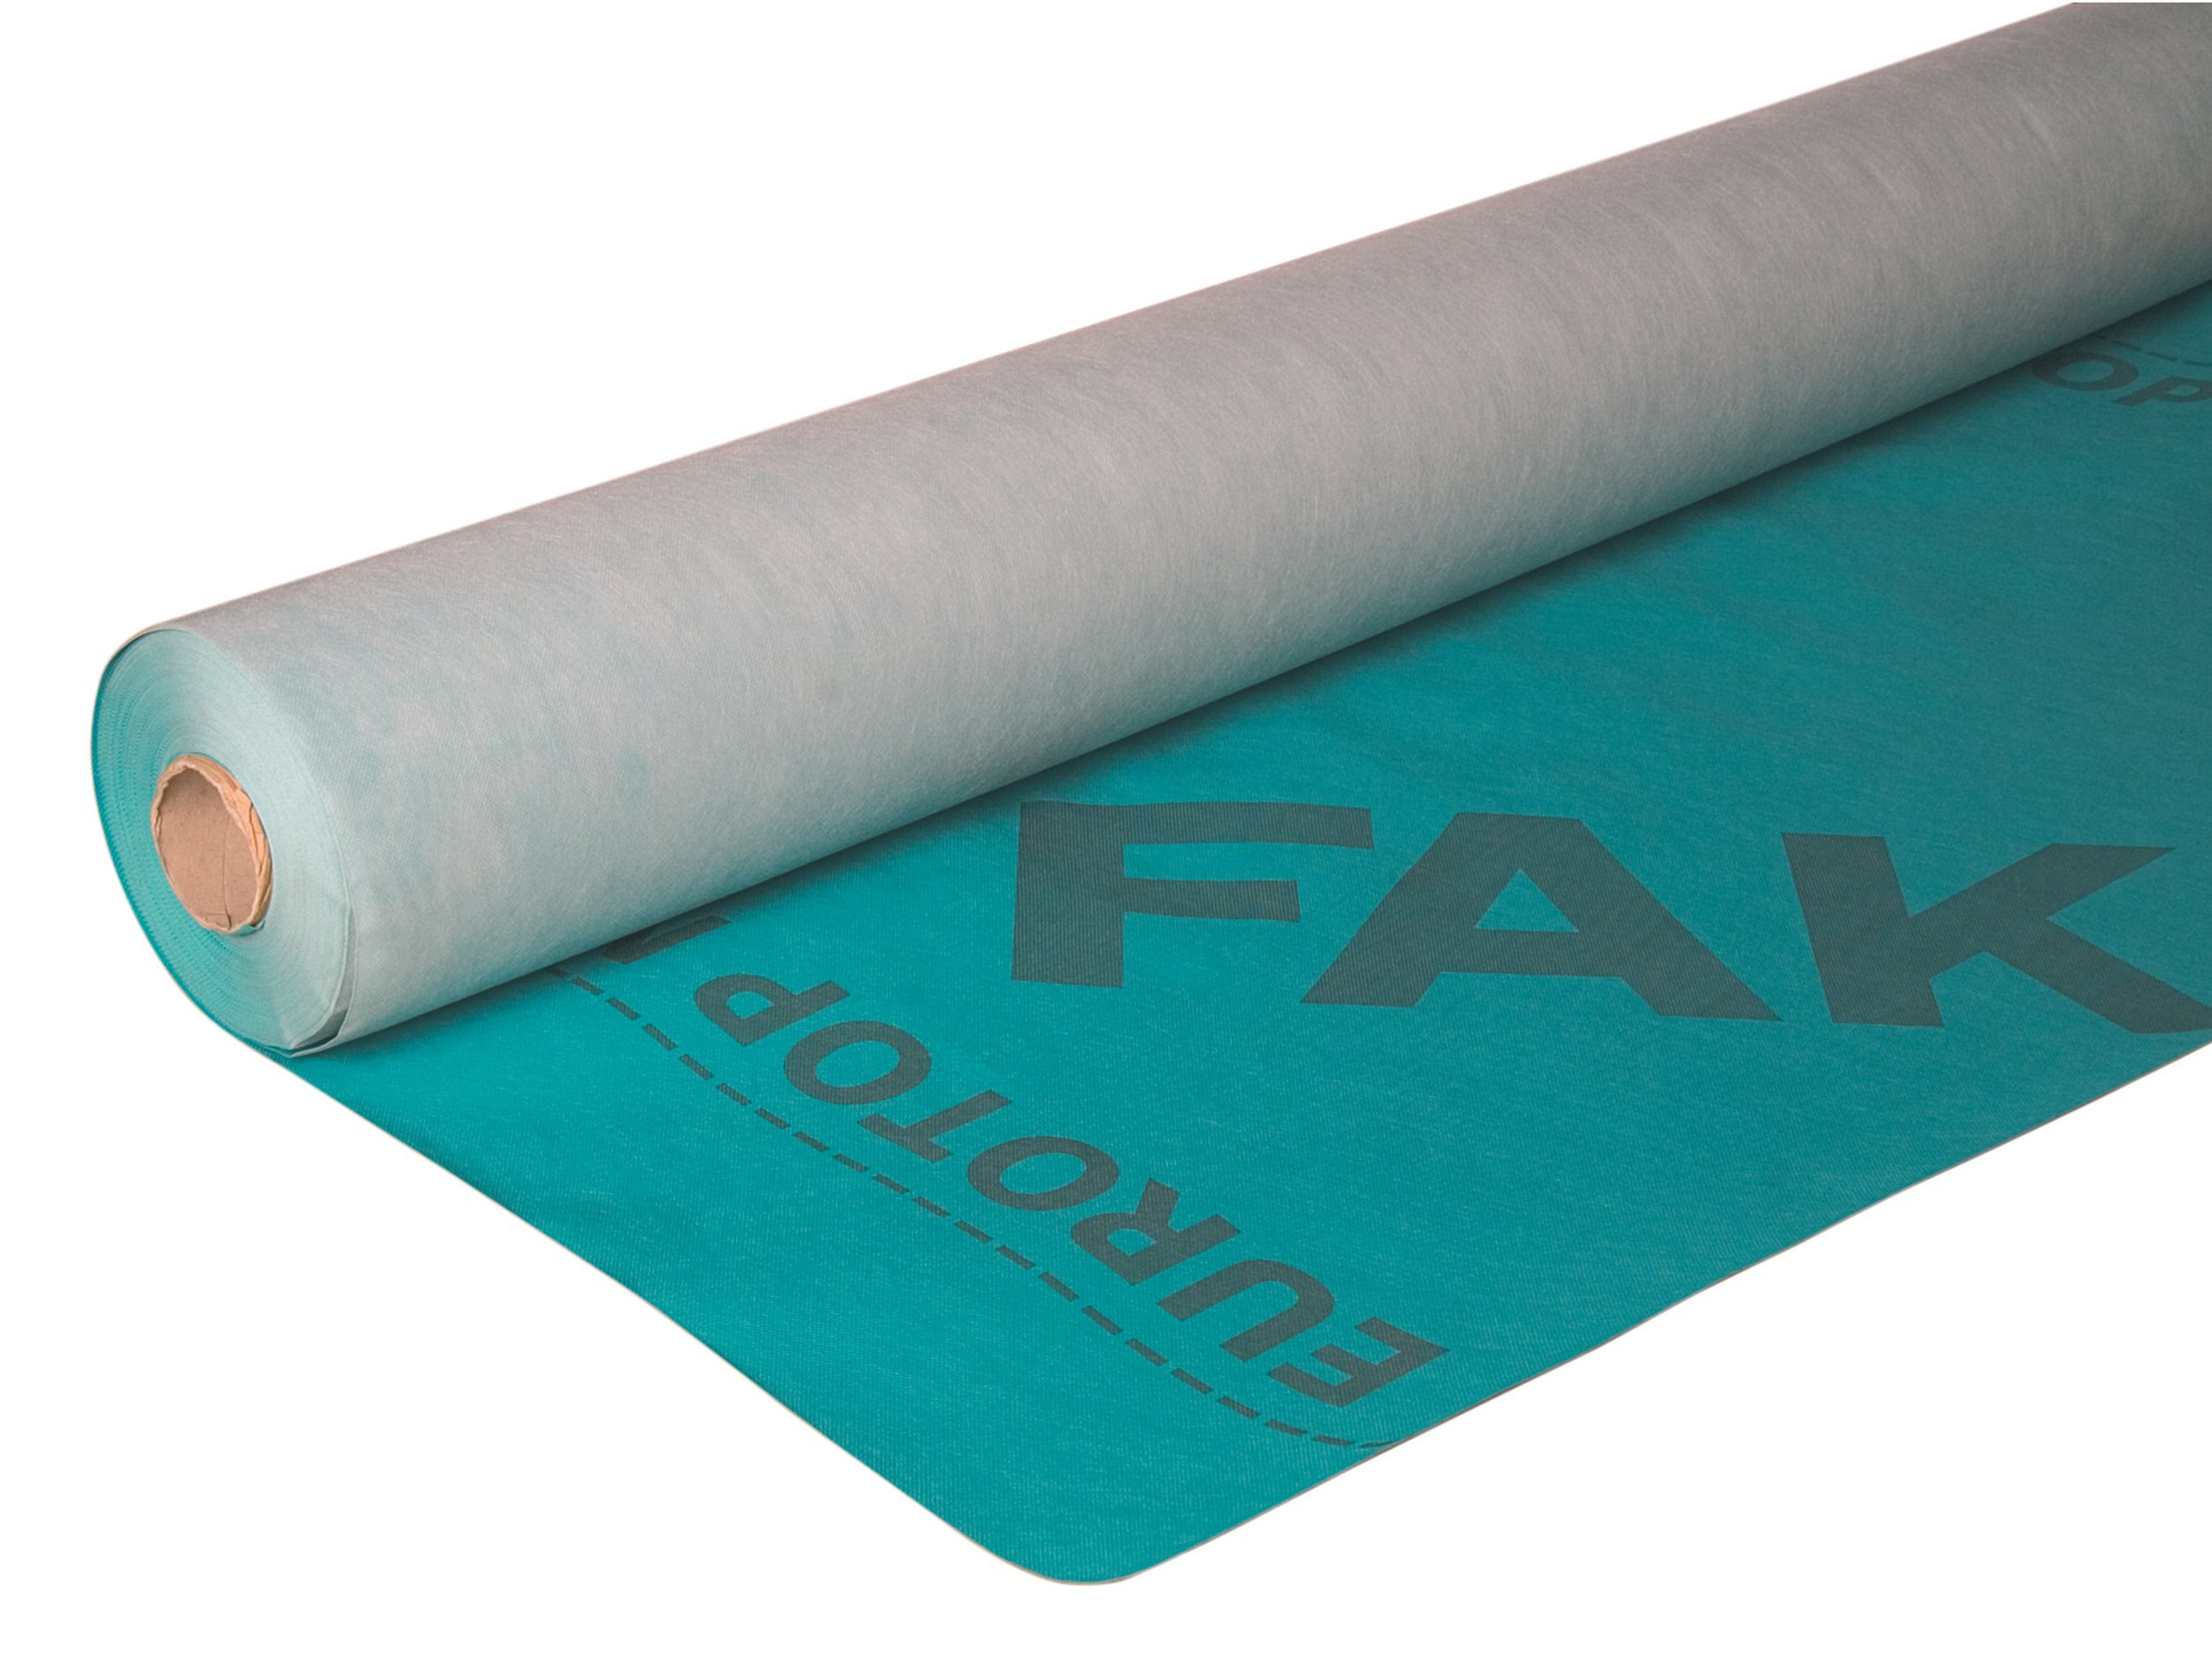 Fakro Eurotop N35 Breather Membrane 50x1.5mt